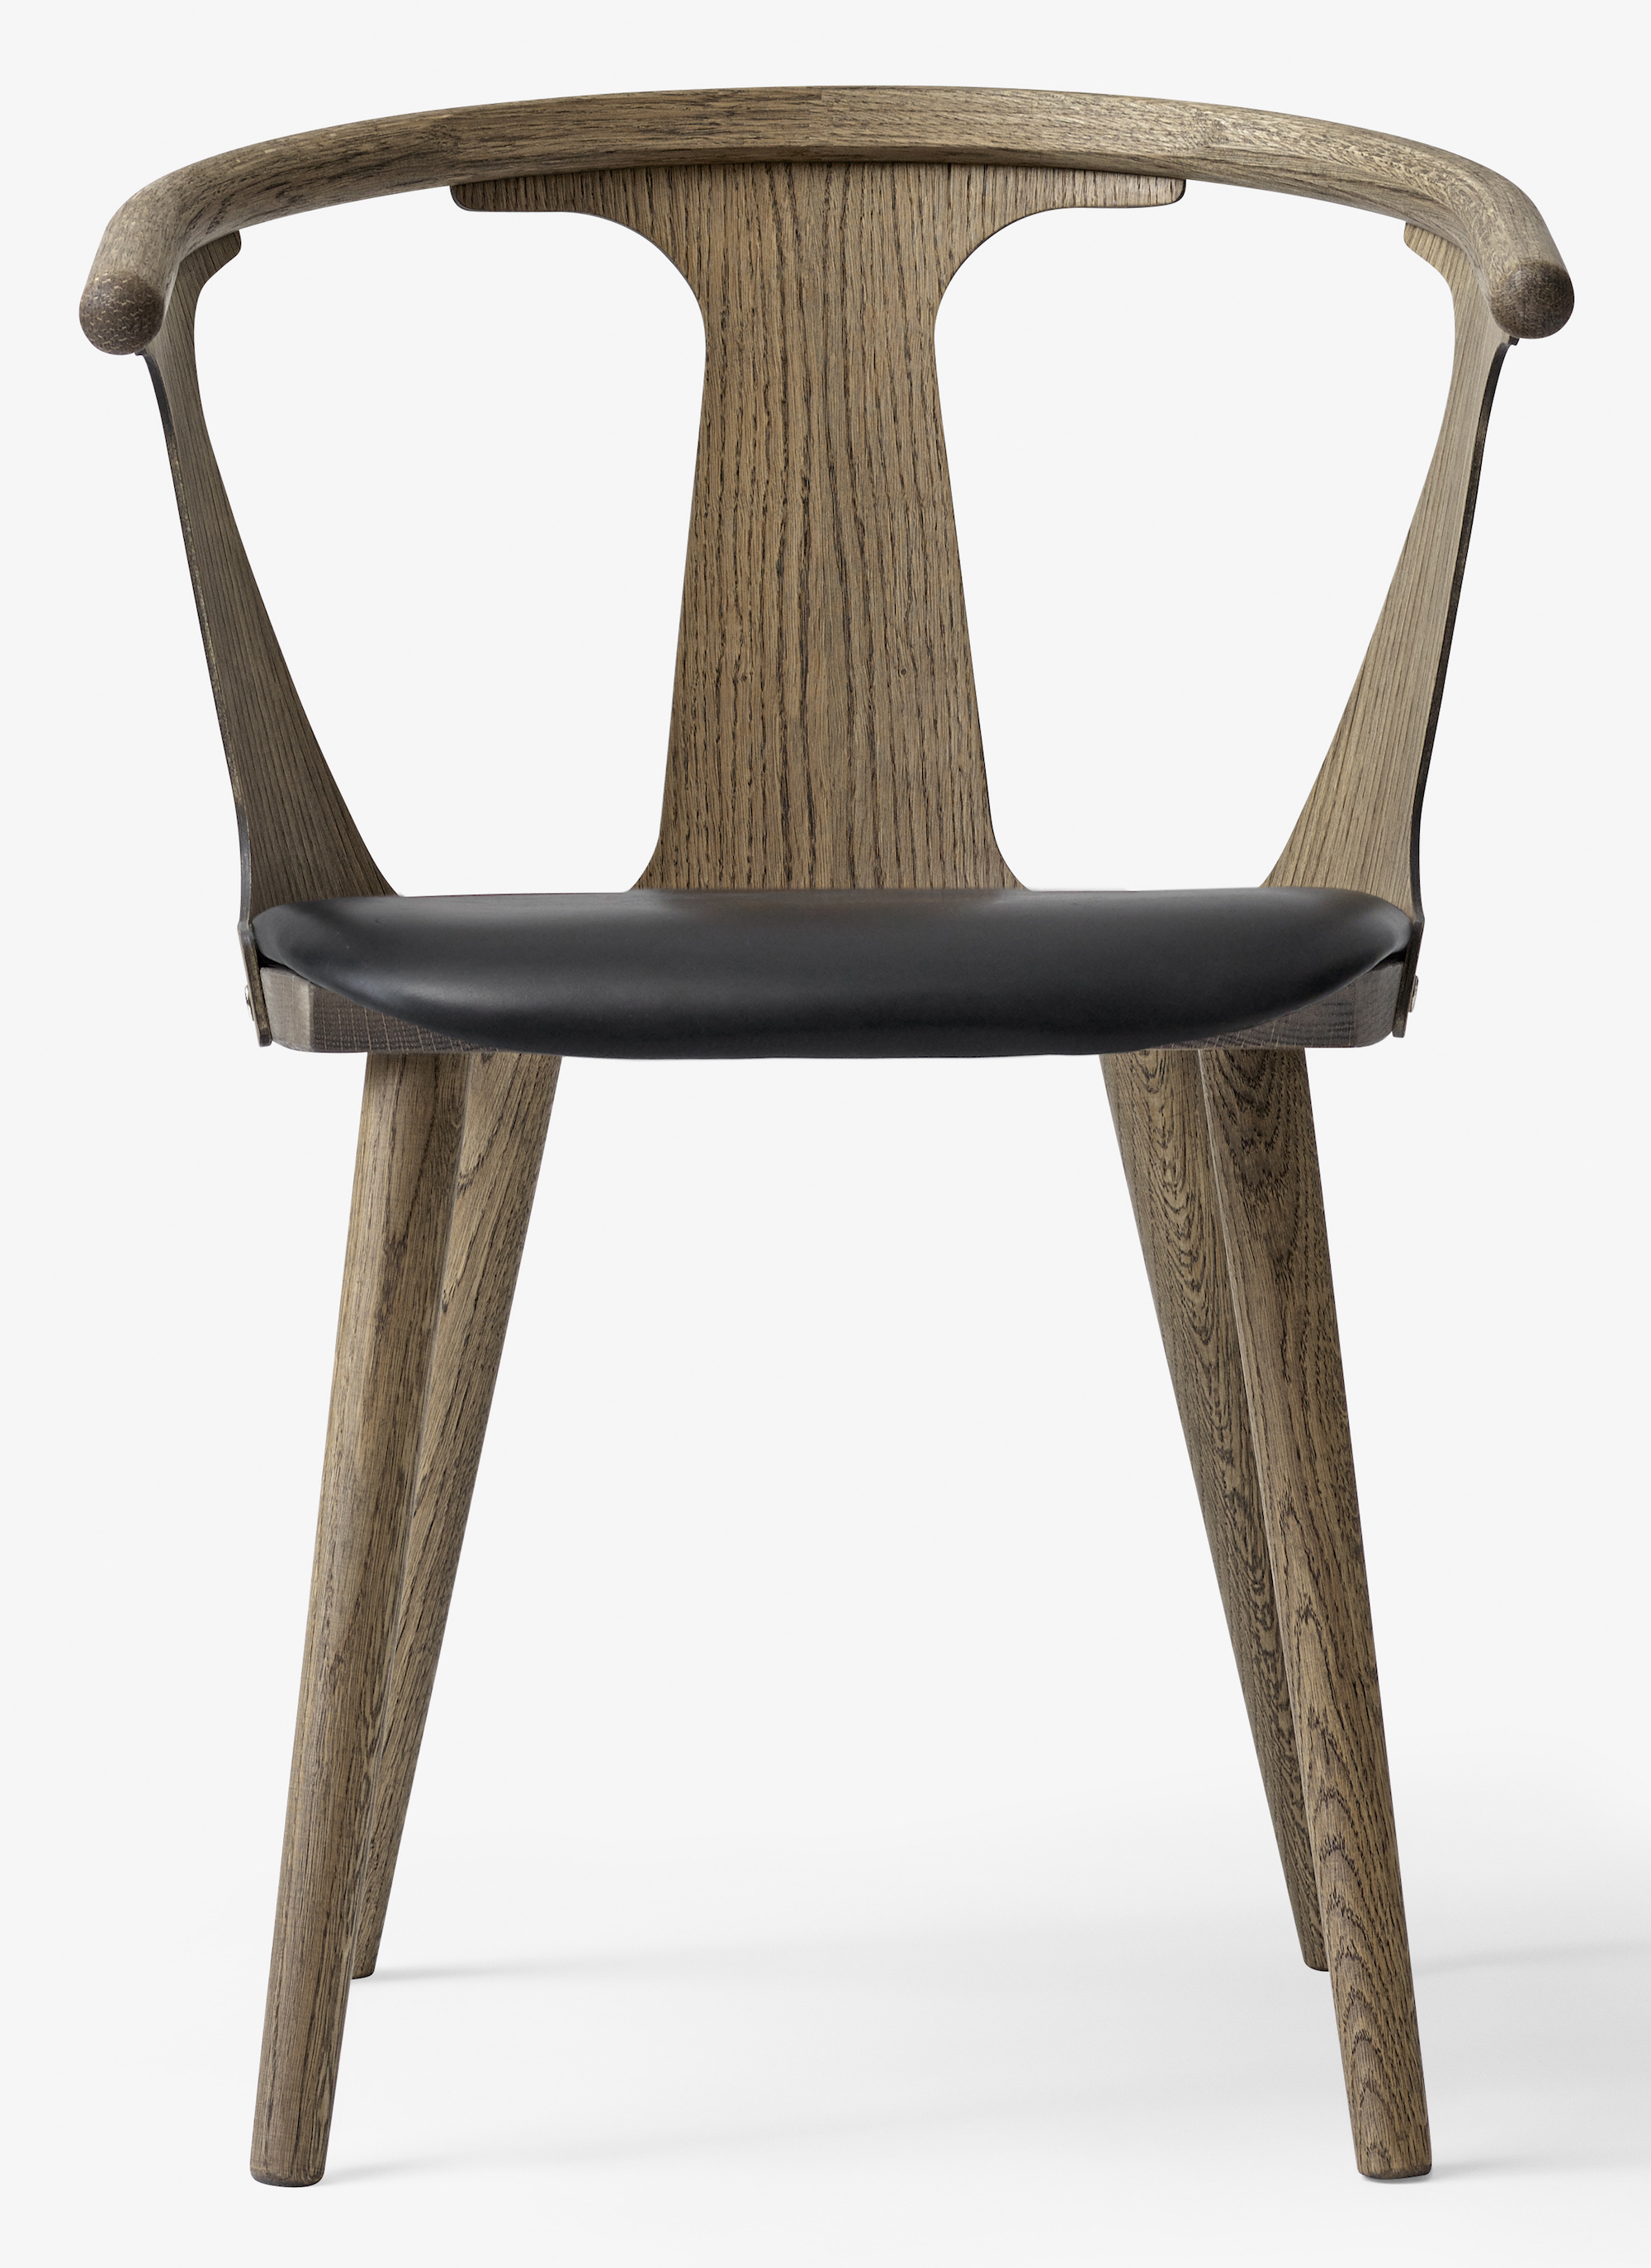 Amp Tradition In Between Chair Design Sami Kallio